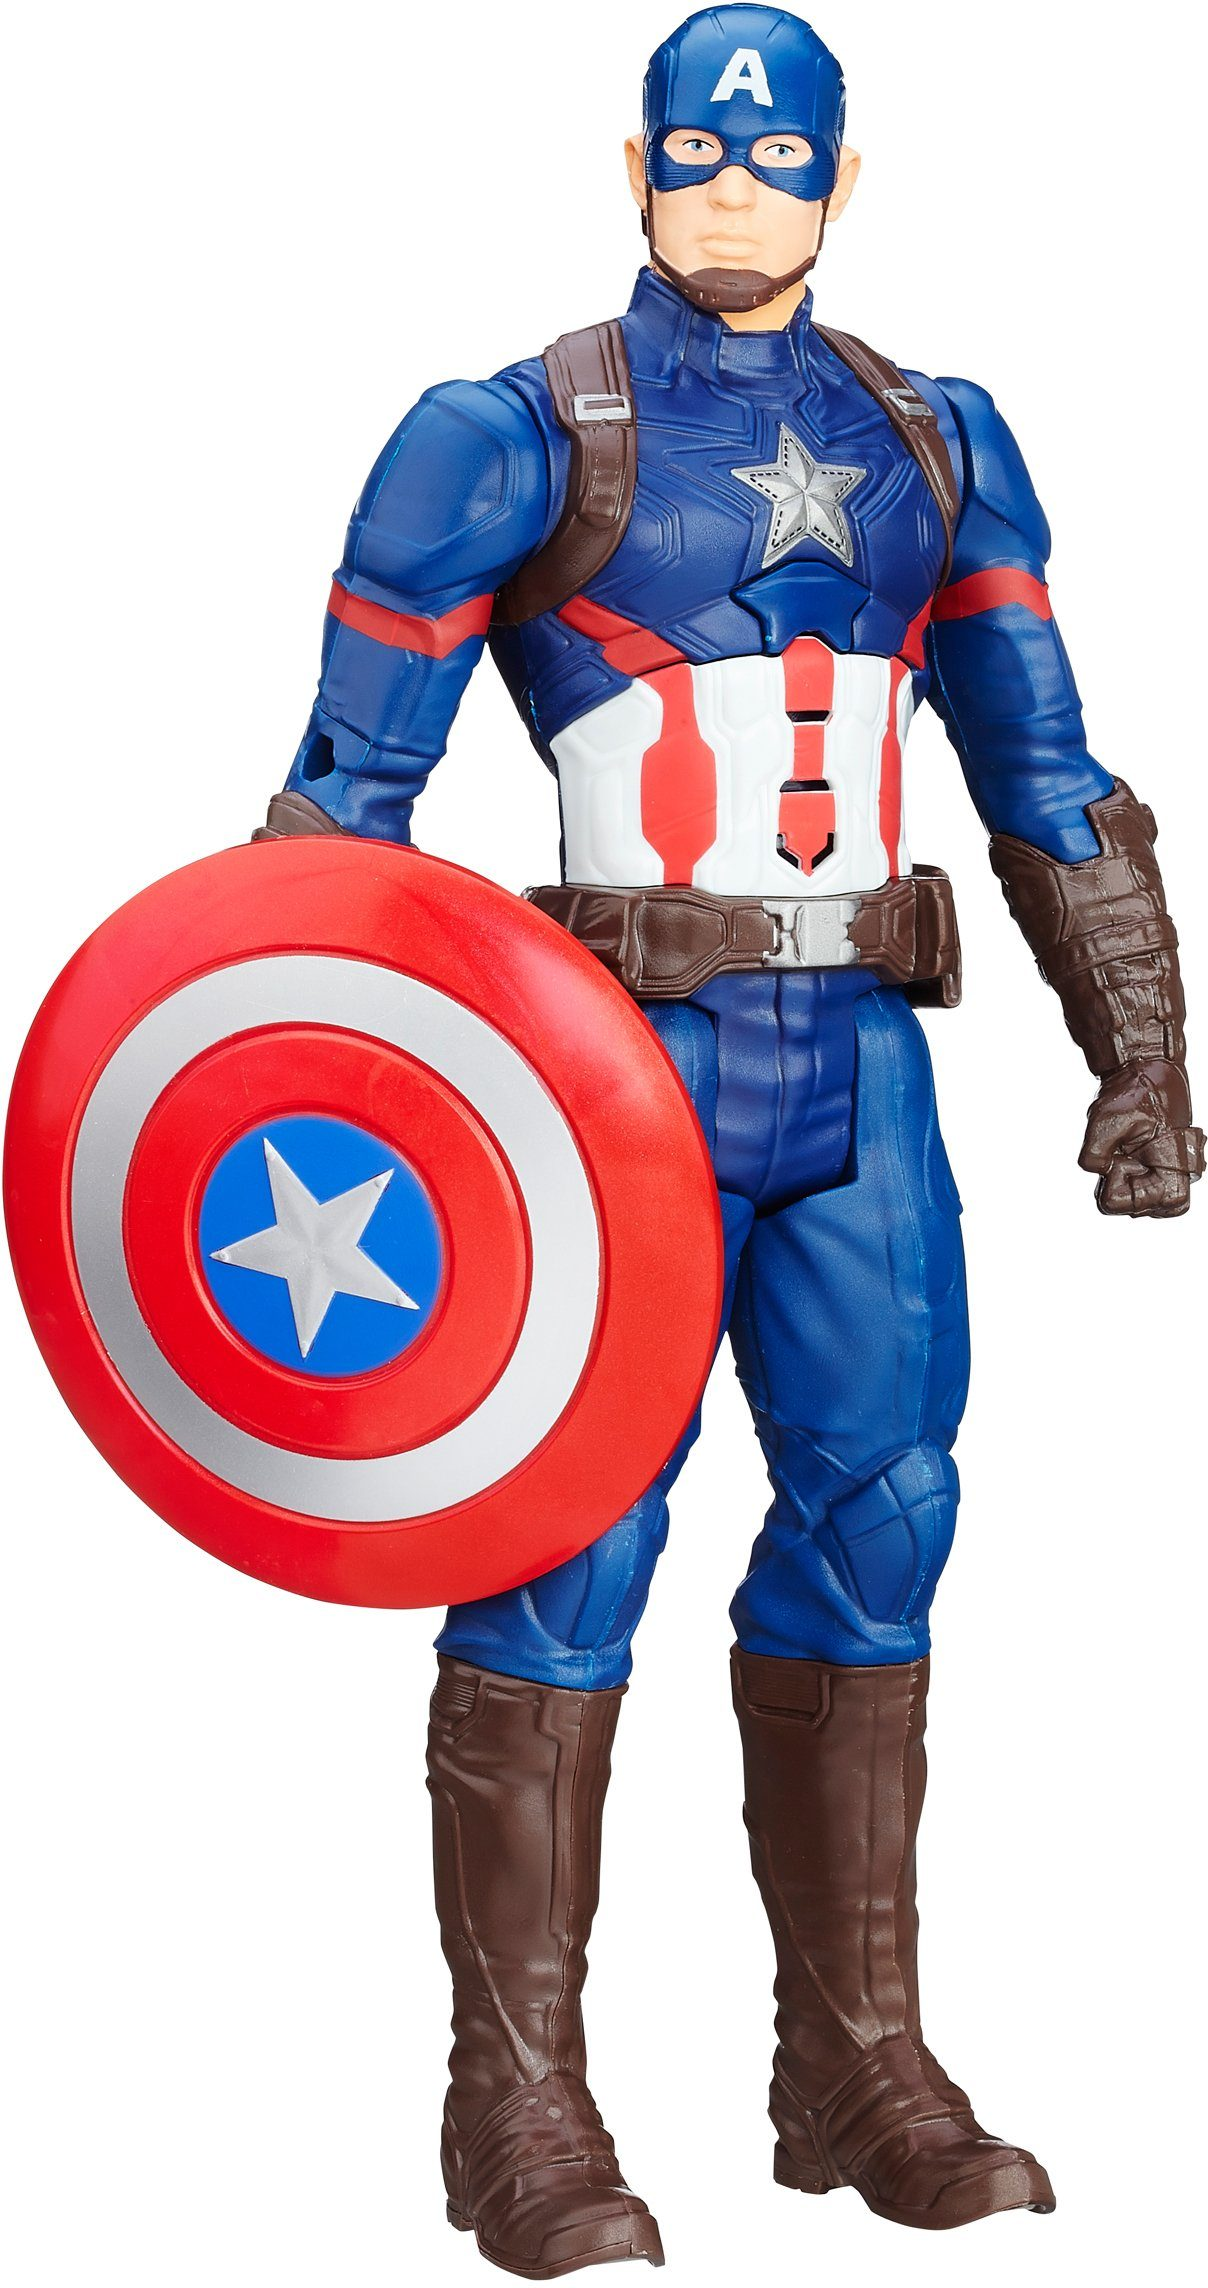 Hasbro Spielfigur, »Marvel Avengers Spielfigur, Captain America«